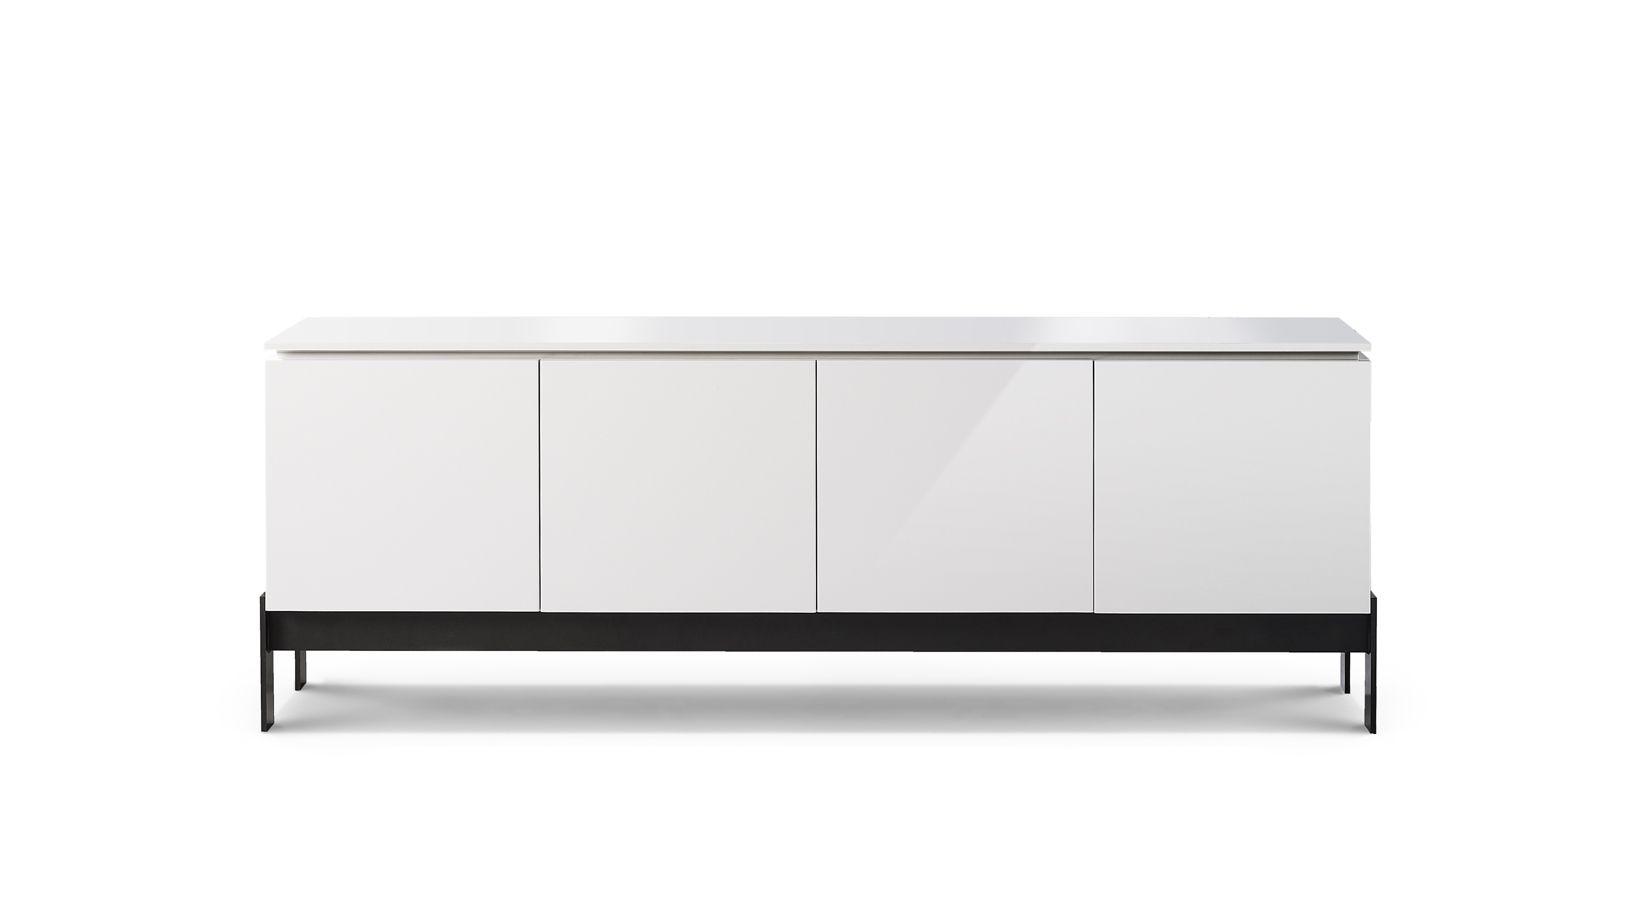 coda dining table roche bobois. Black Bedroom Furniture Sets. Home Design Ideas